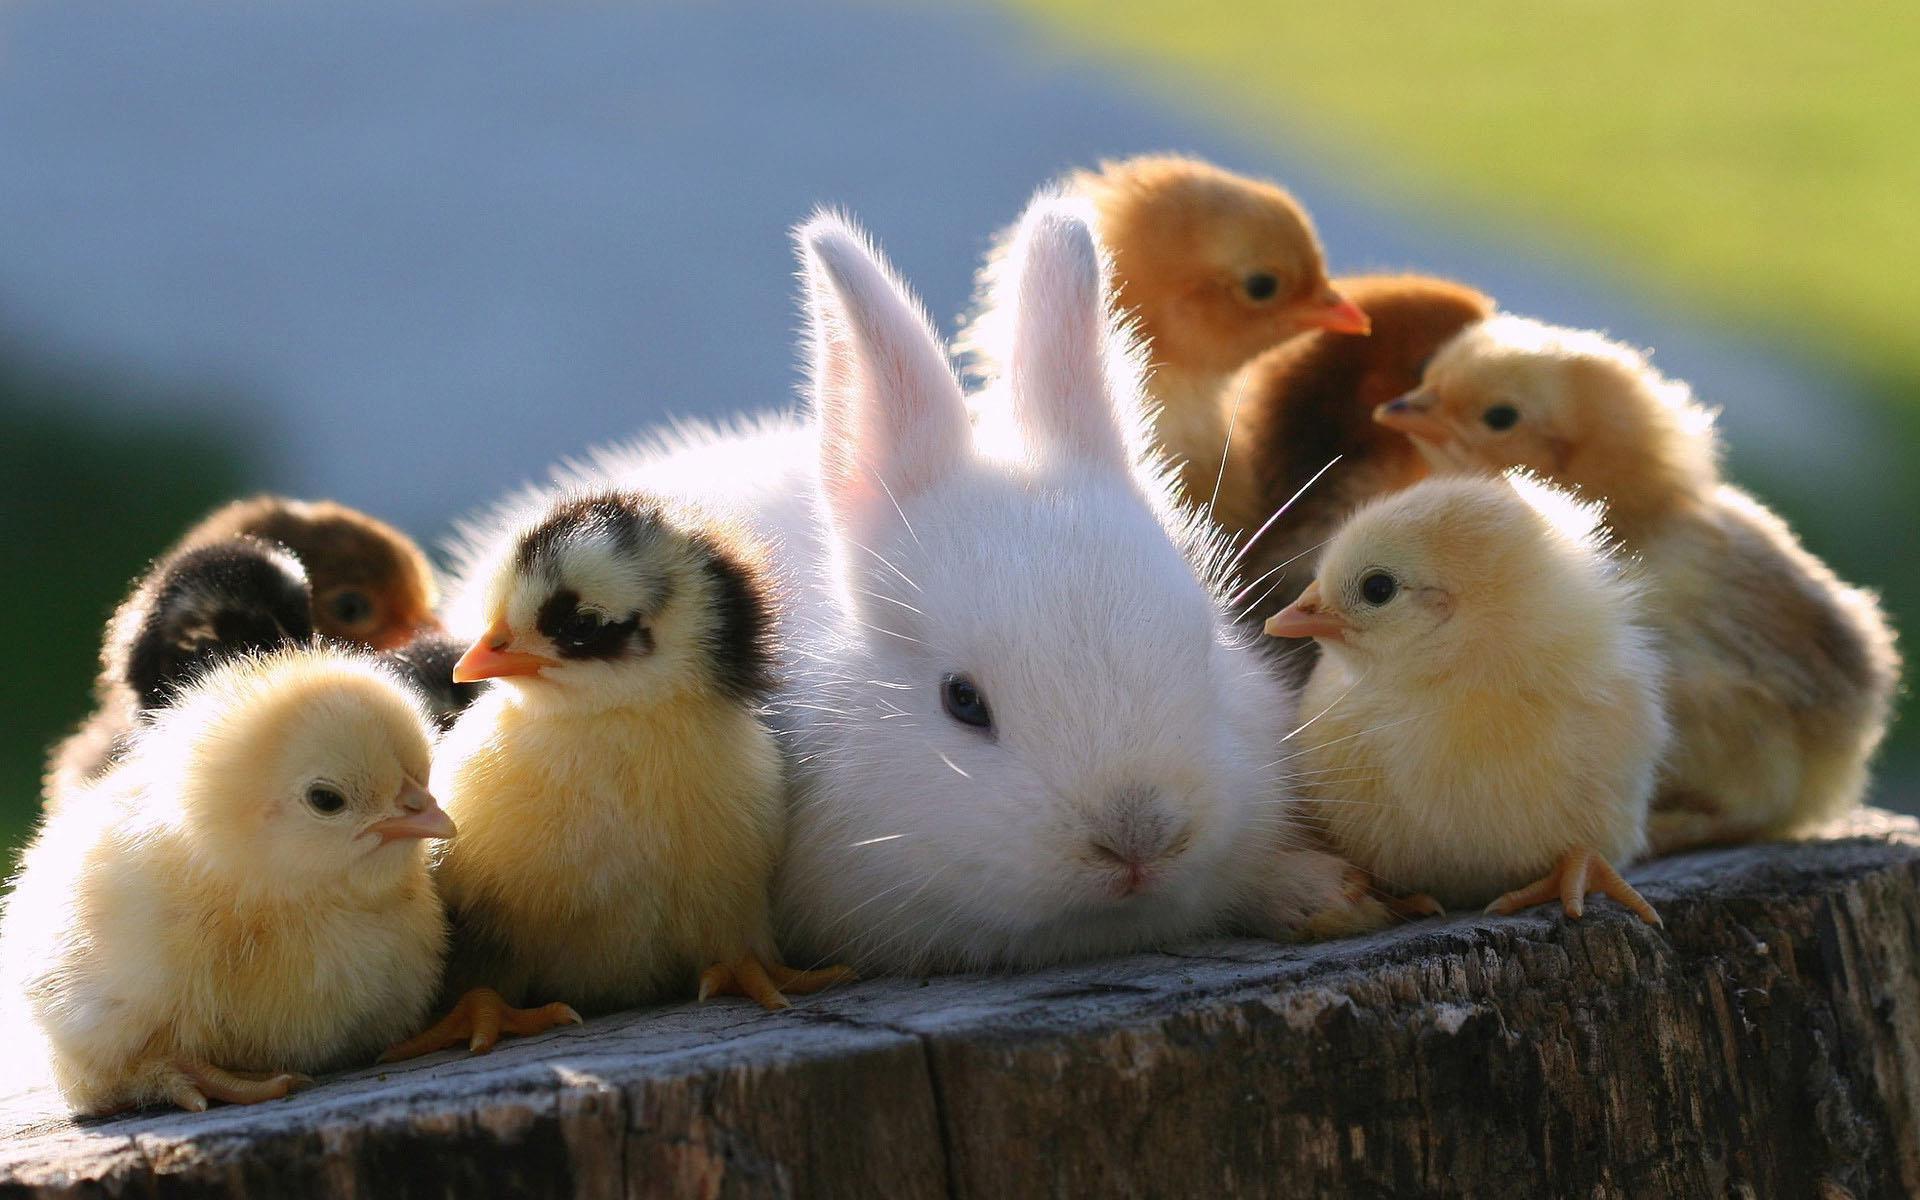 6158307-images-animals.jpg